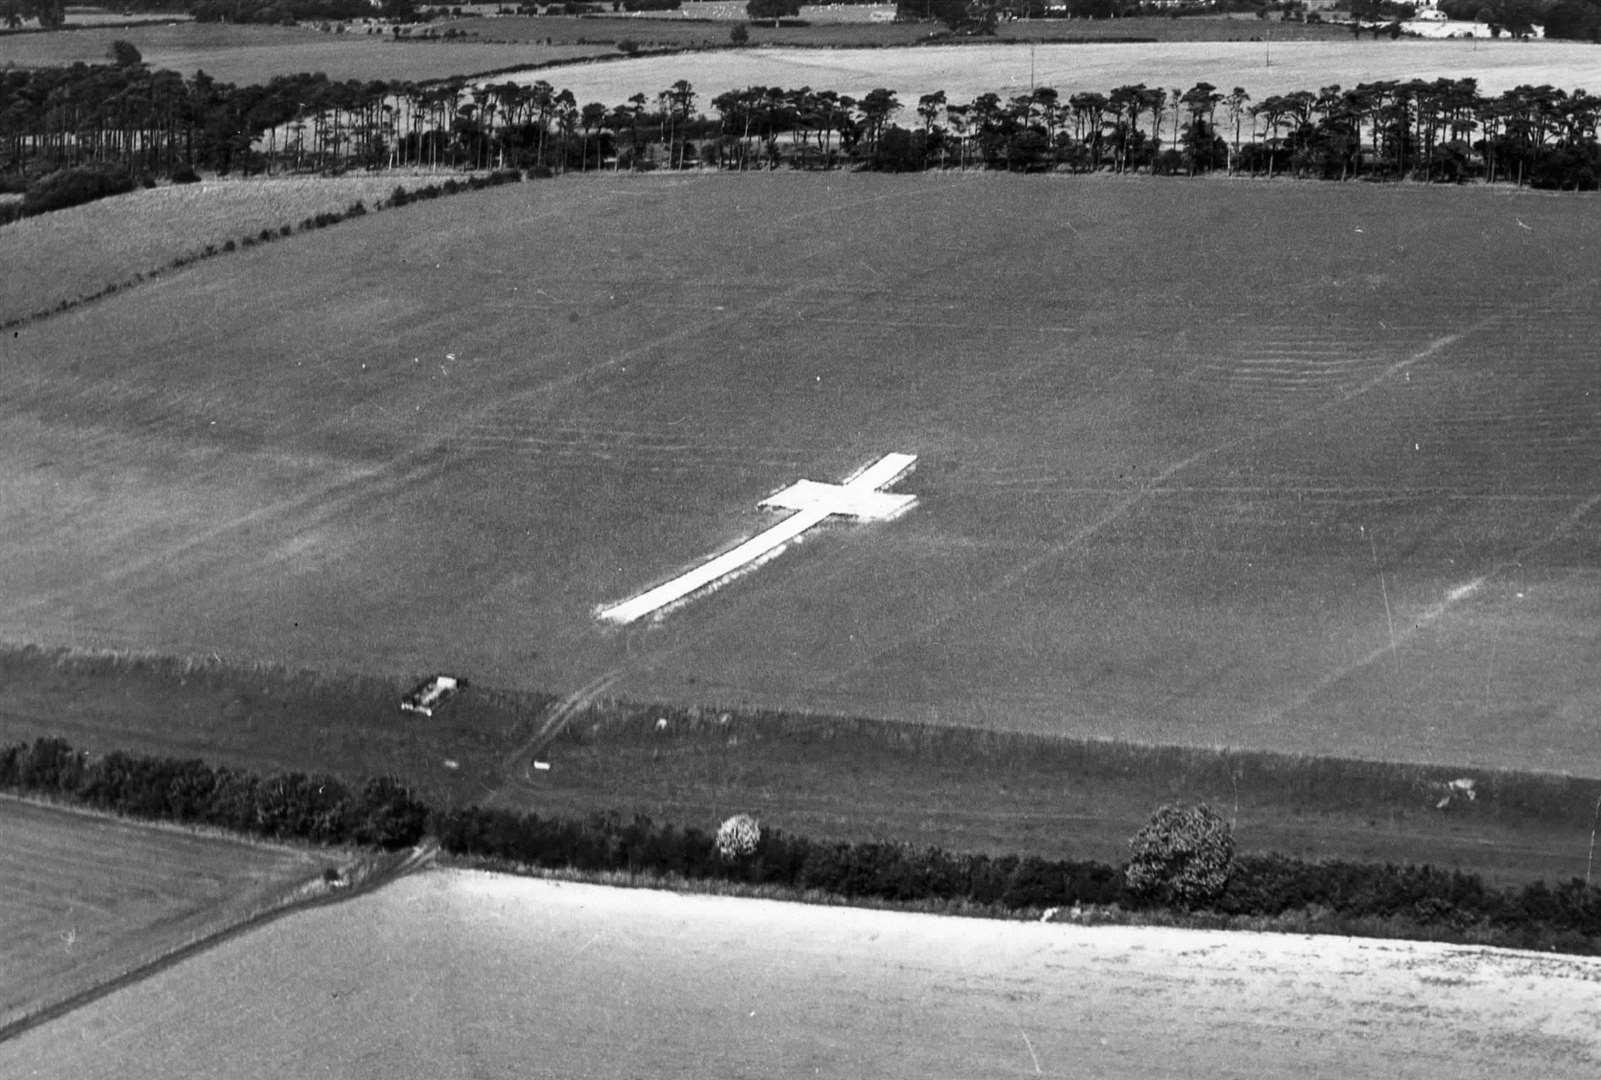 La cruz blanca se destaca al costado de la colina de Lenham